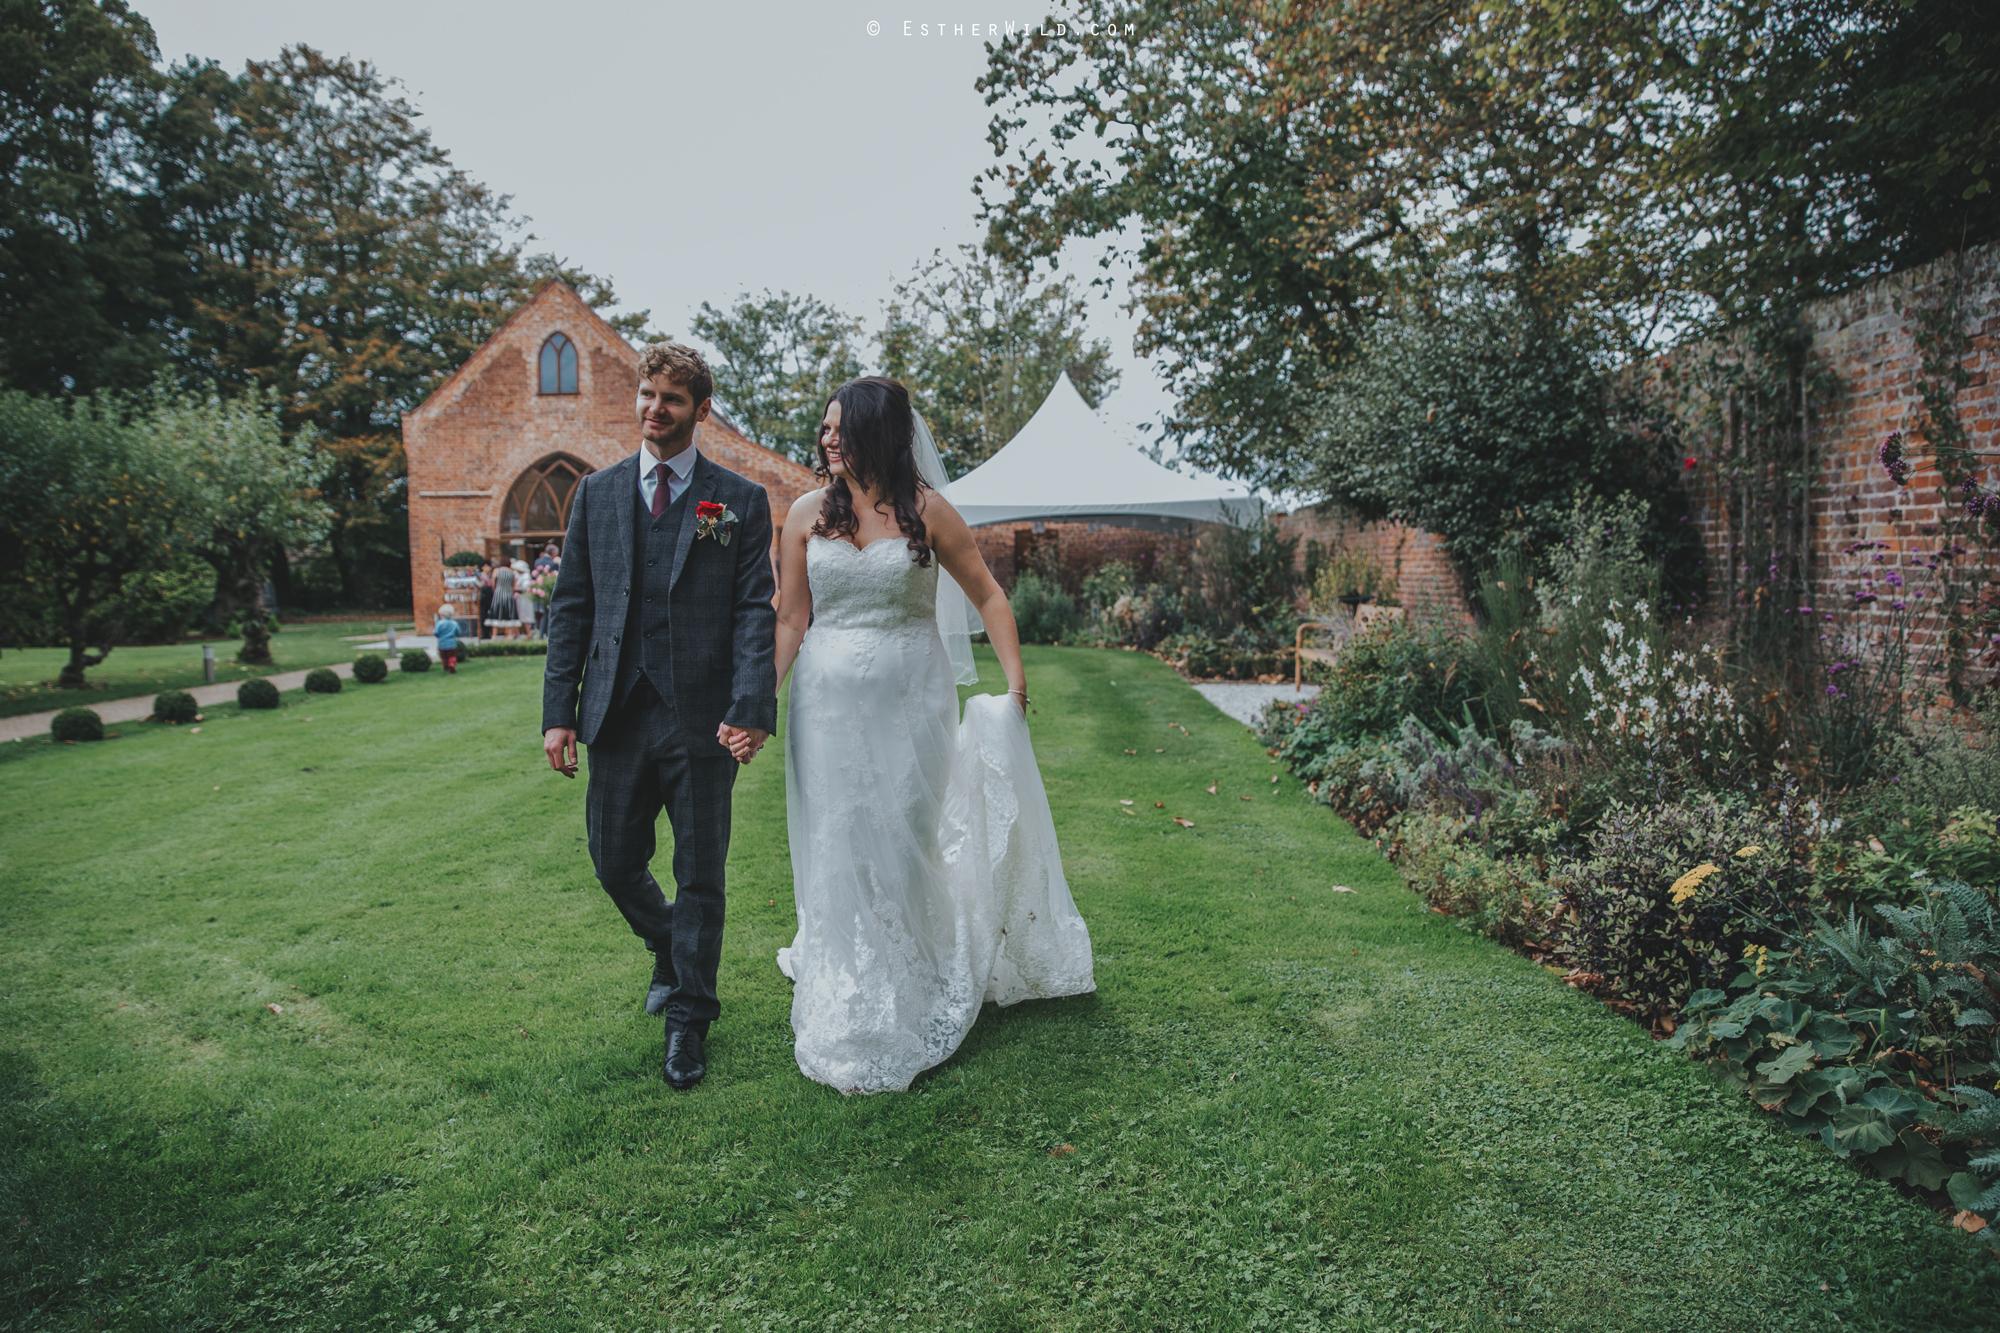 Reading_Room_Weddings_Alby_Norwich_Photographer_Esther_Wild_IMG_1767.jpg